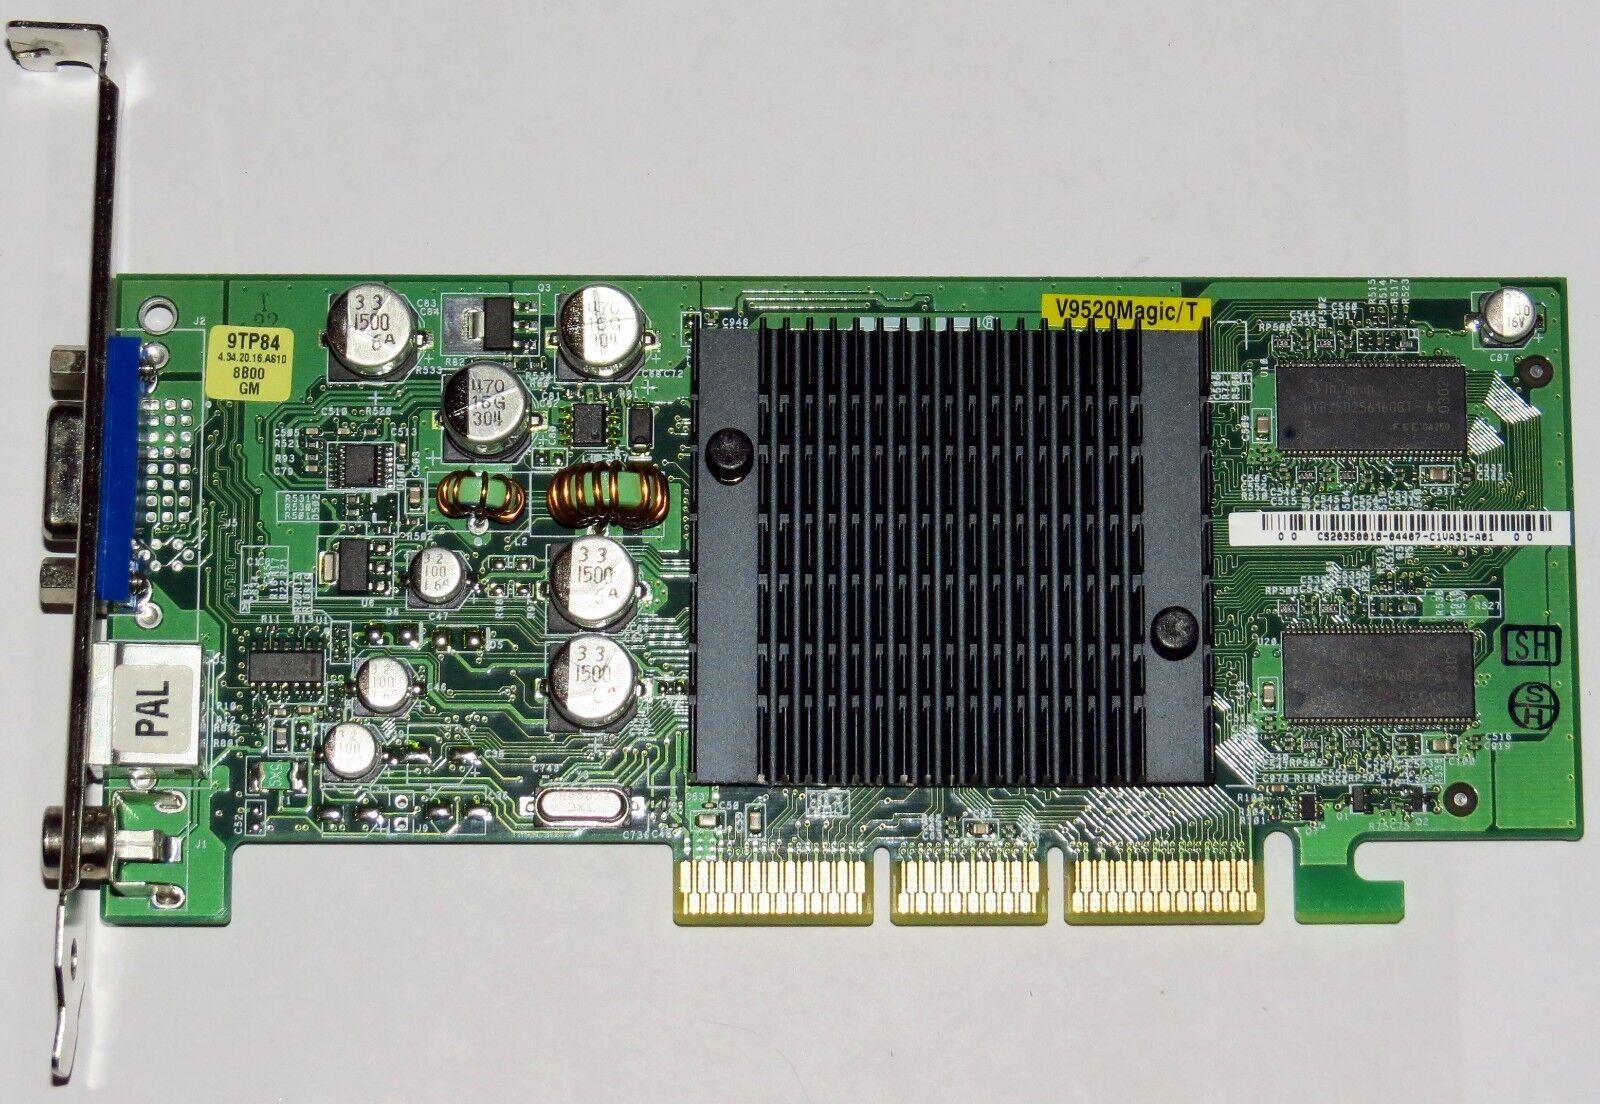 V9520MAGICT DRIVERS FOR WINDOWS MAC